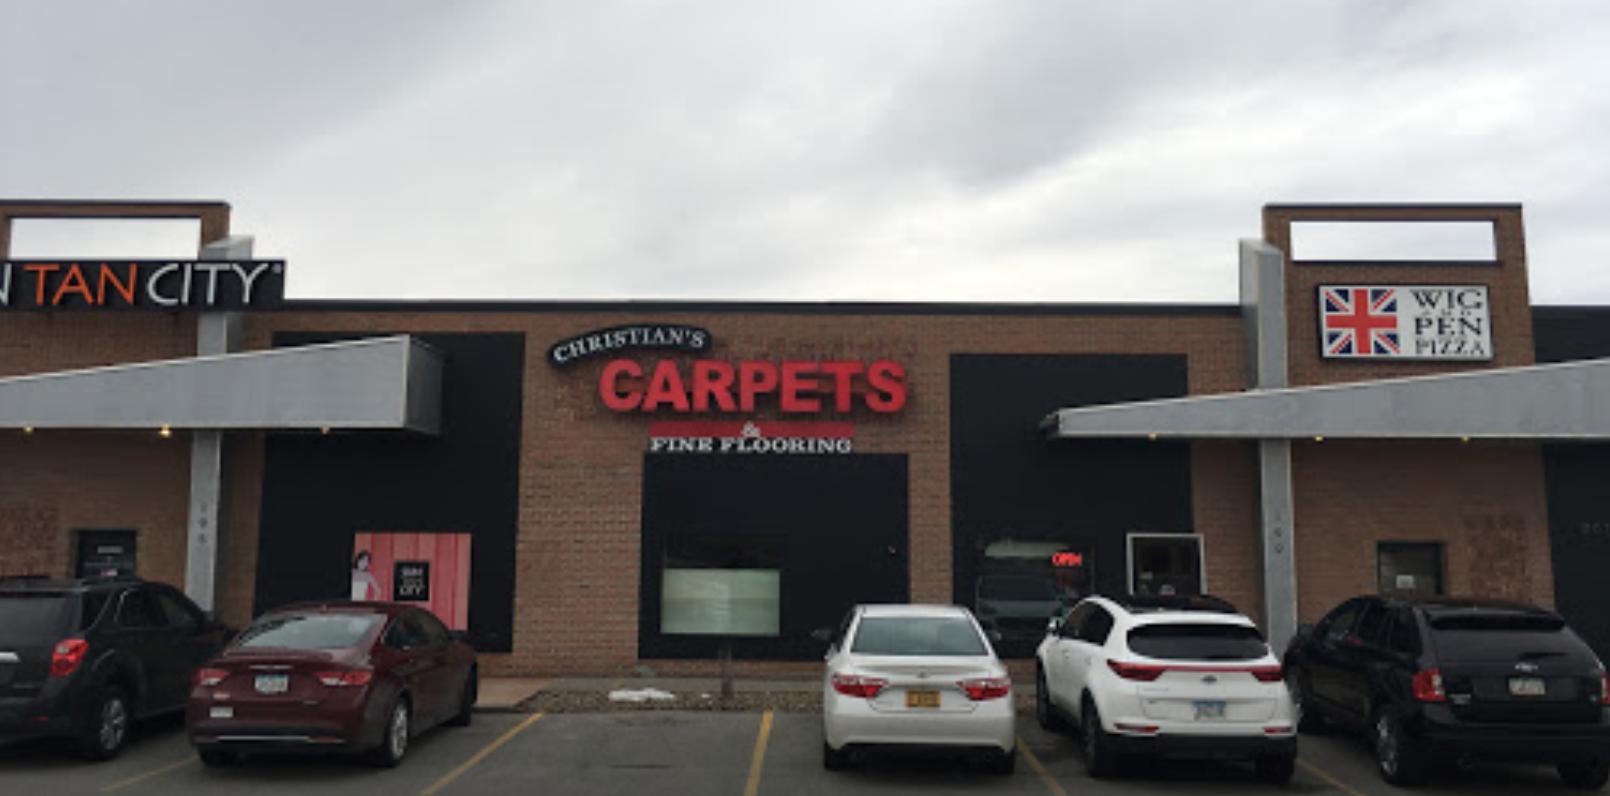 Christian's Carpets & Fine Flooring - 199 Hwy 965 NE North Liberty, IA 52317